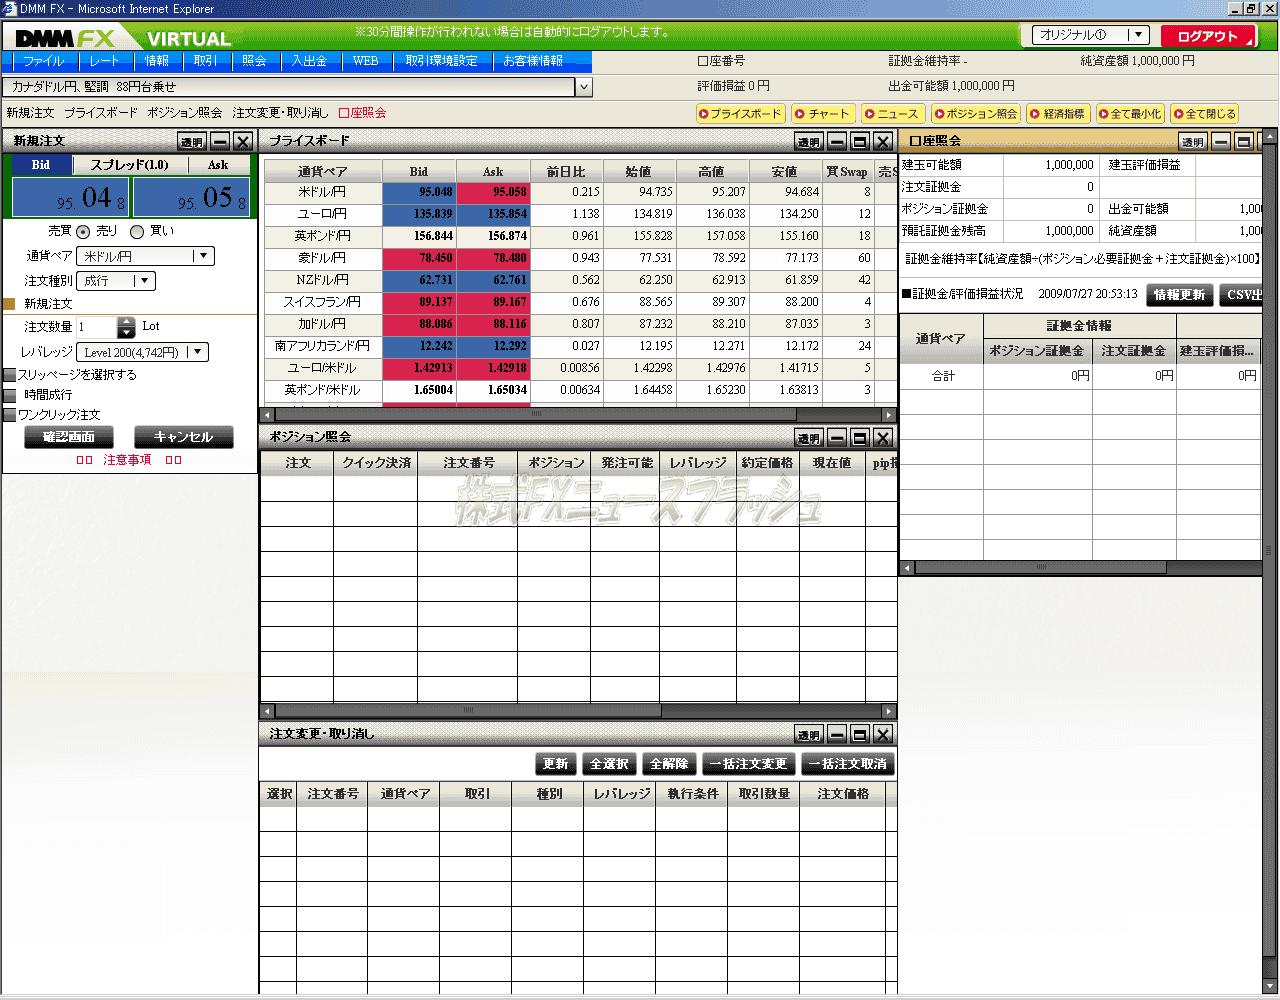 DMM.com証券 DMMFX バーチャル取引 バーチャルFX デモ取引 取引画面